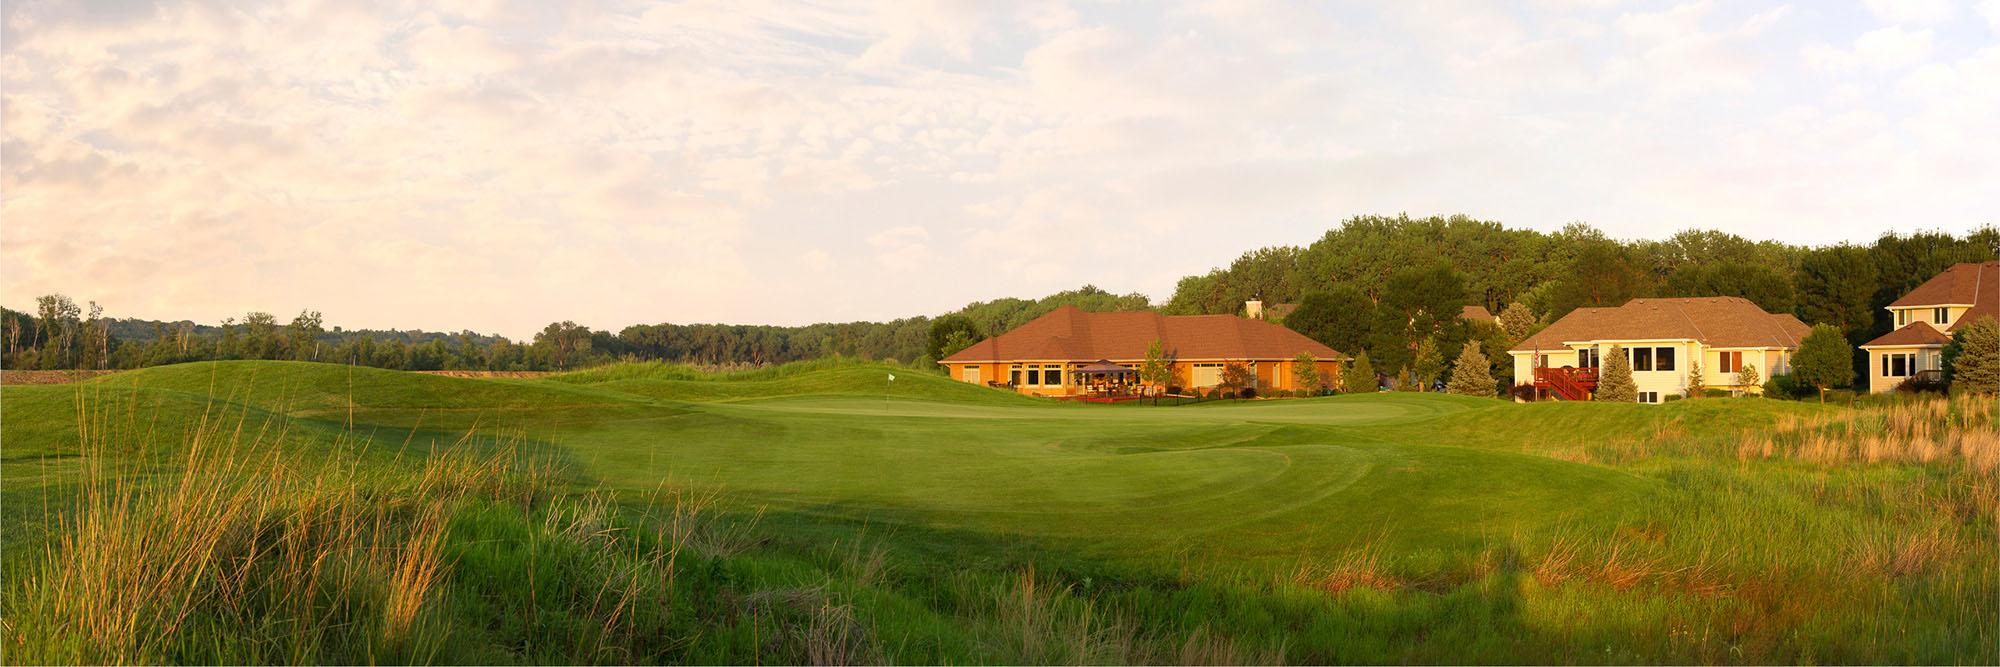 Golf Course Image - Dakota Dunes No. 4